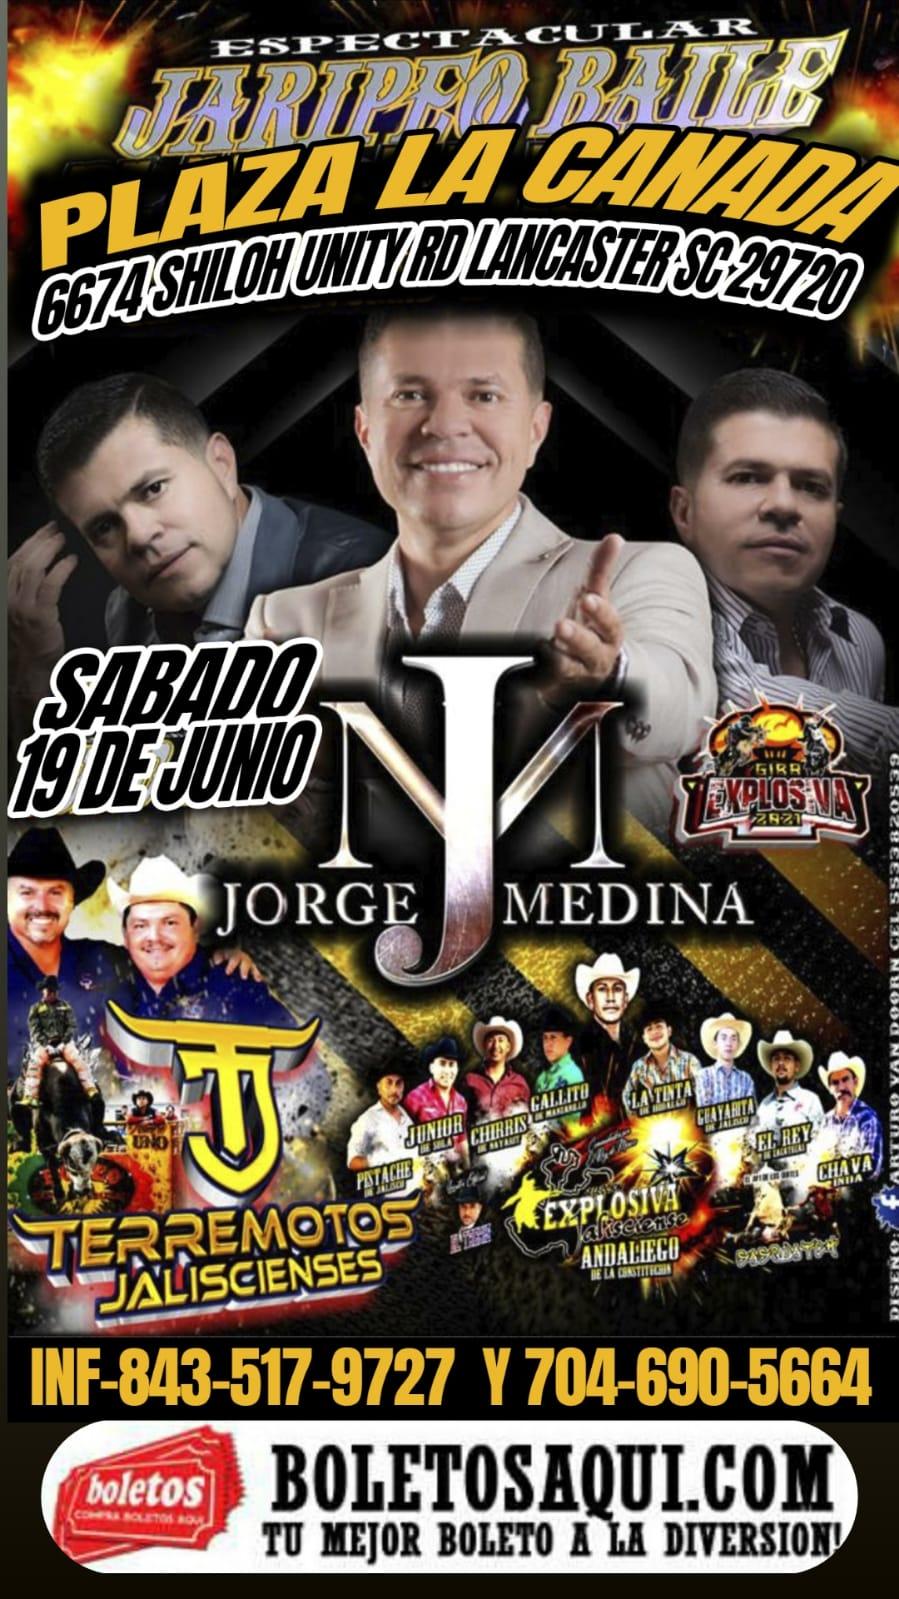 Espectacular Jaripeo Baile, Jorge Medina, Terremotos Jaliscienses y Explosiva Jalisciense. – Landcaster, SC